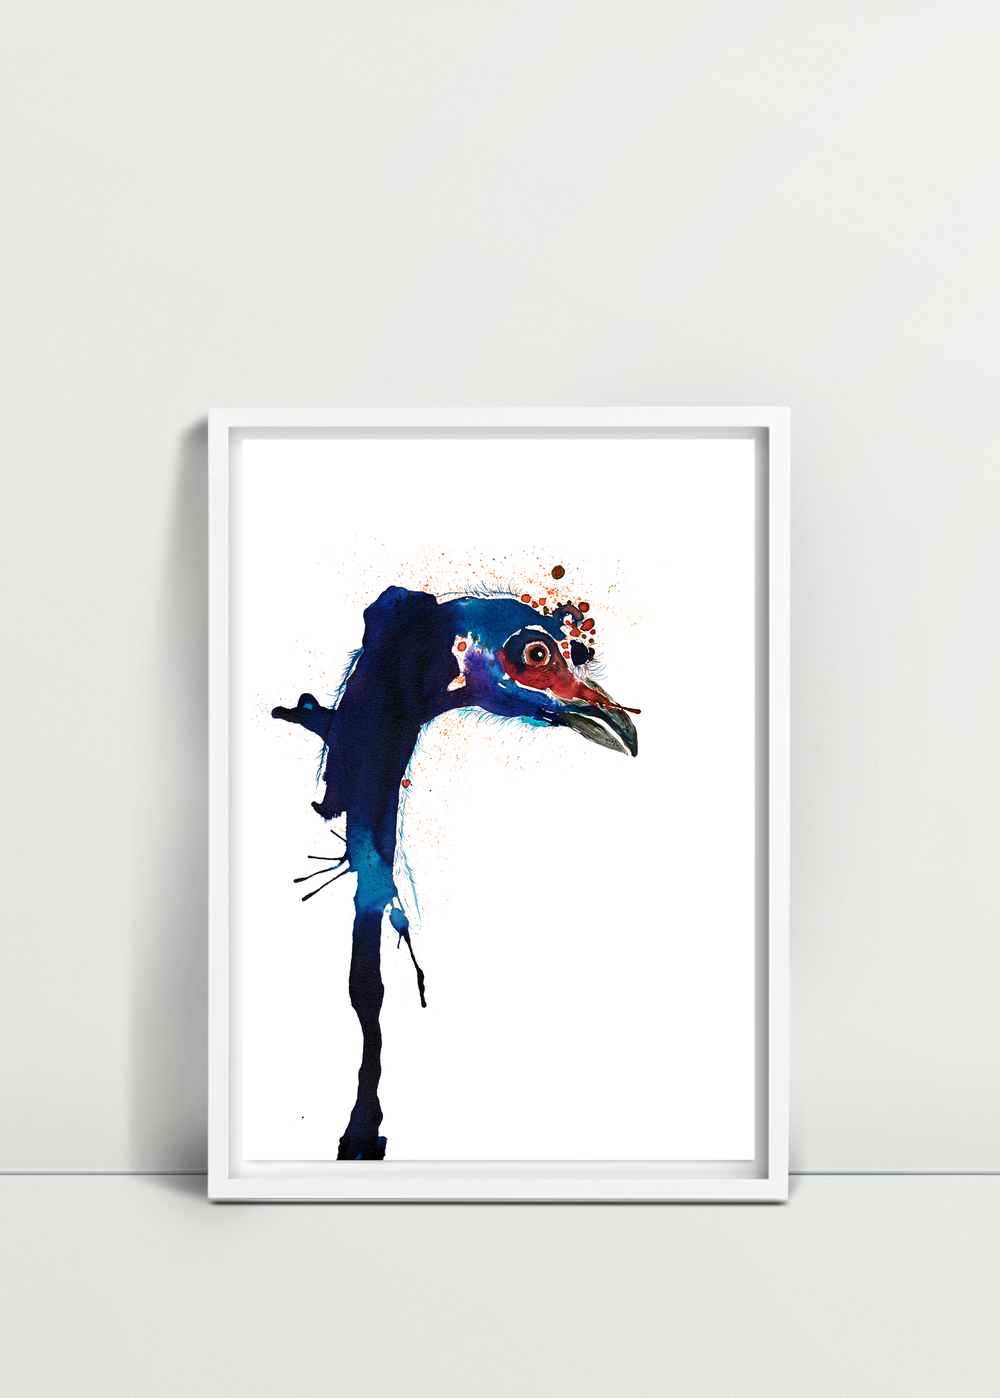 Parrot_14.png